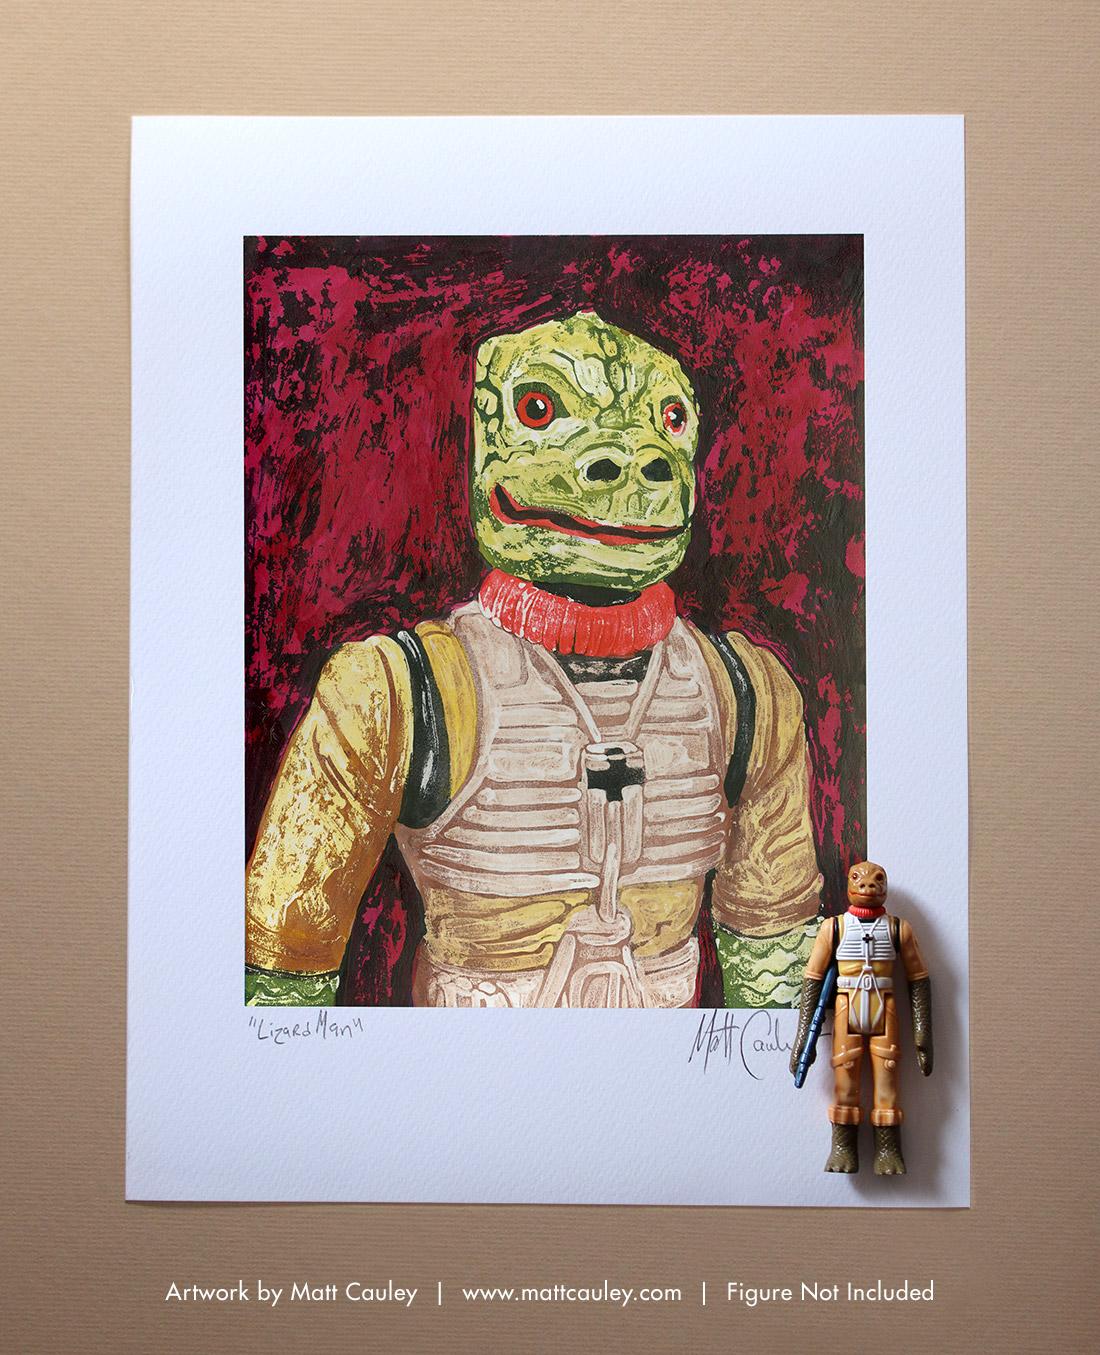 LANDO CALRISSIAN Vintage Kenner Star Wars Action Figure ORIGINAL ART PRINT 3.75